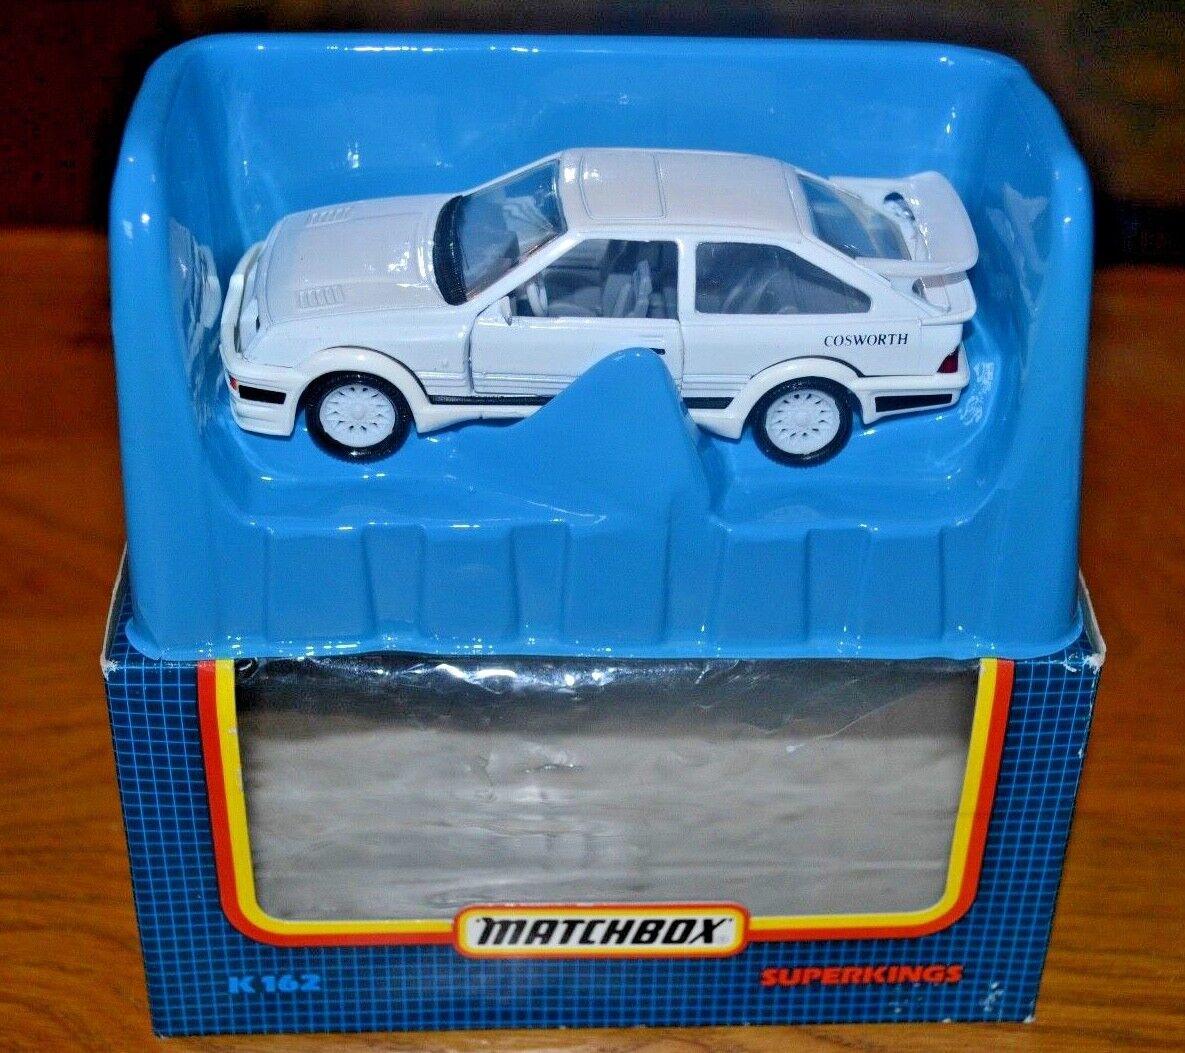 VINTAGE MATCHBOX SUPERKINGS K162 Sierra RS Cosworth en Original Boîte De Fenêtre